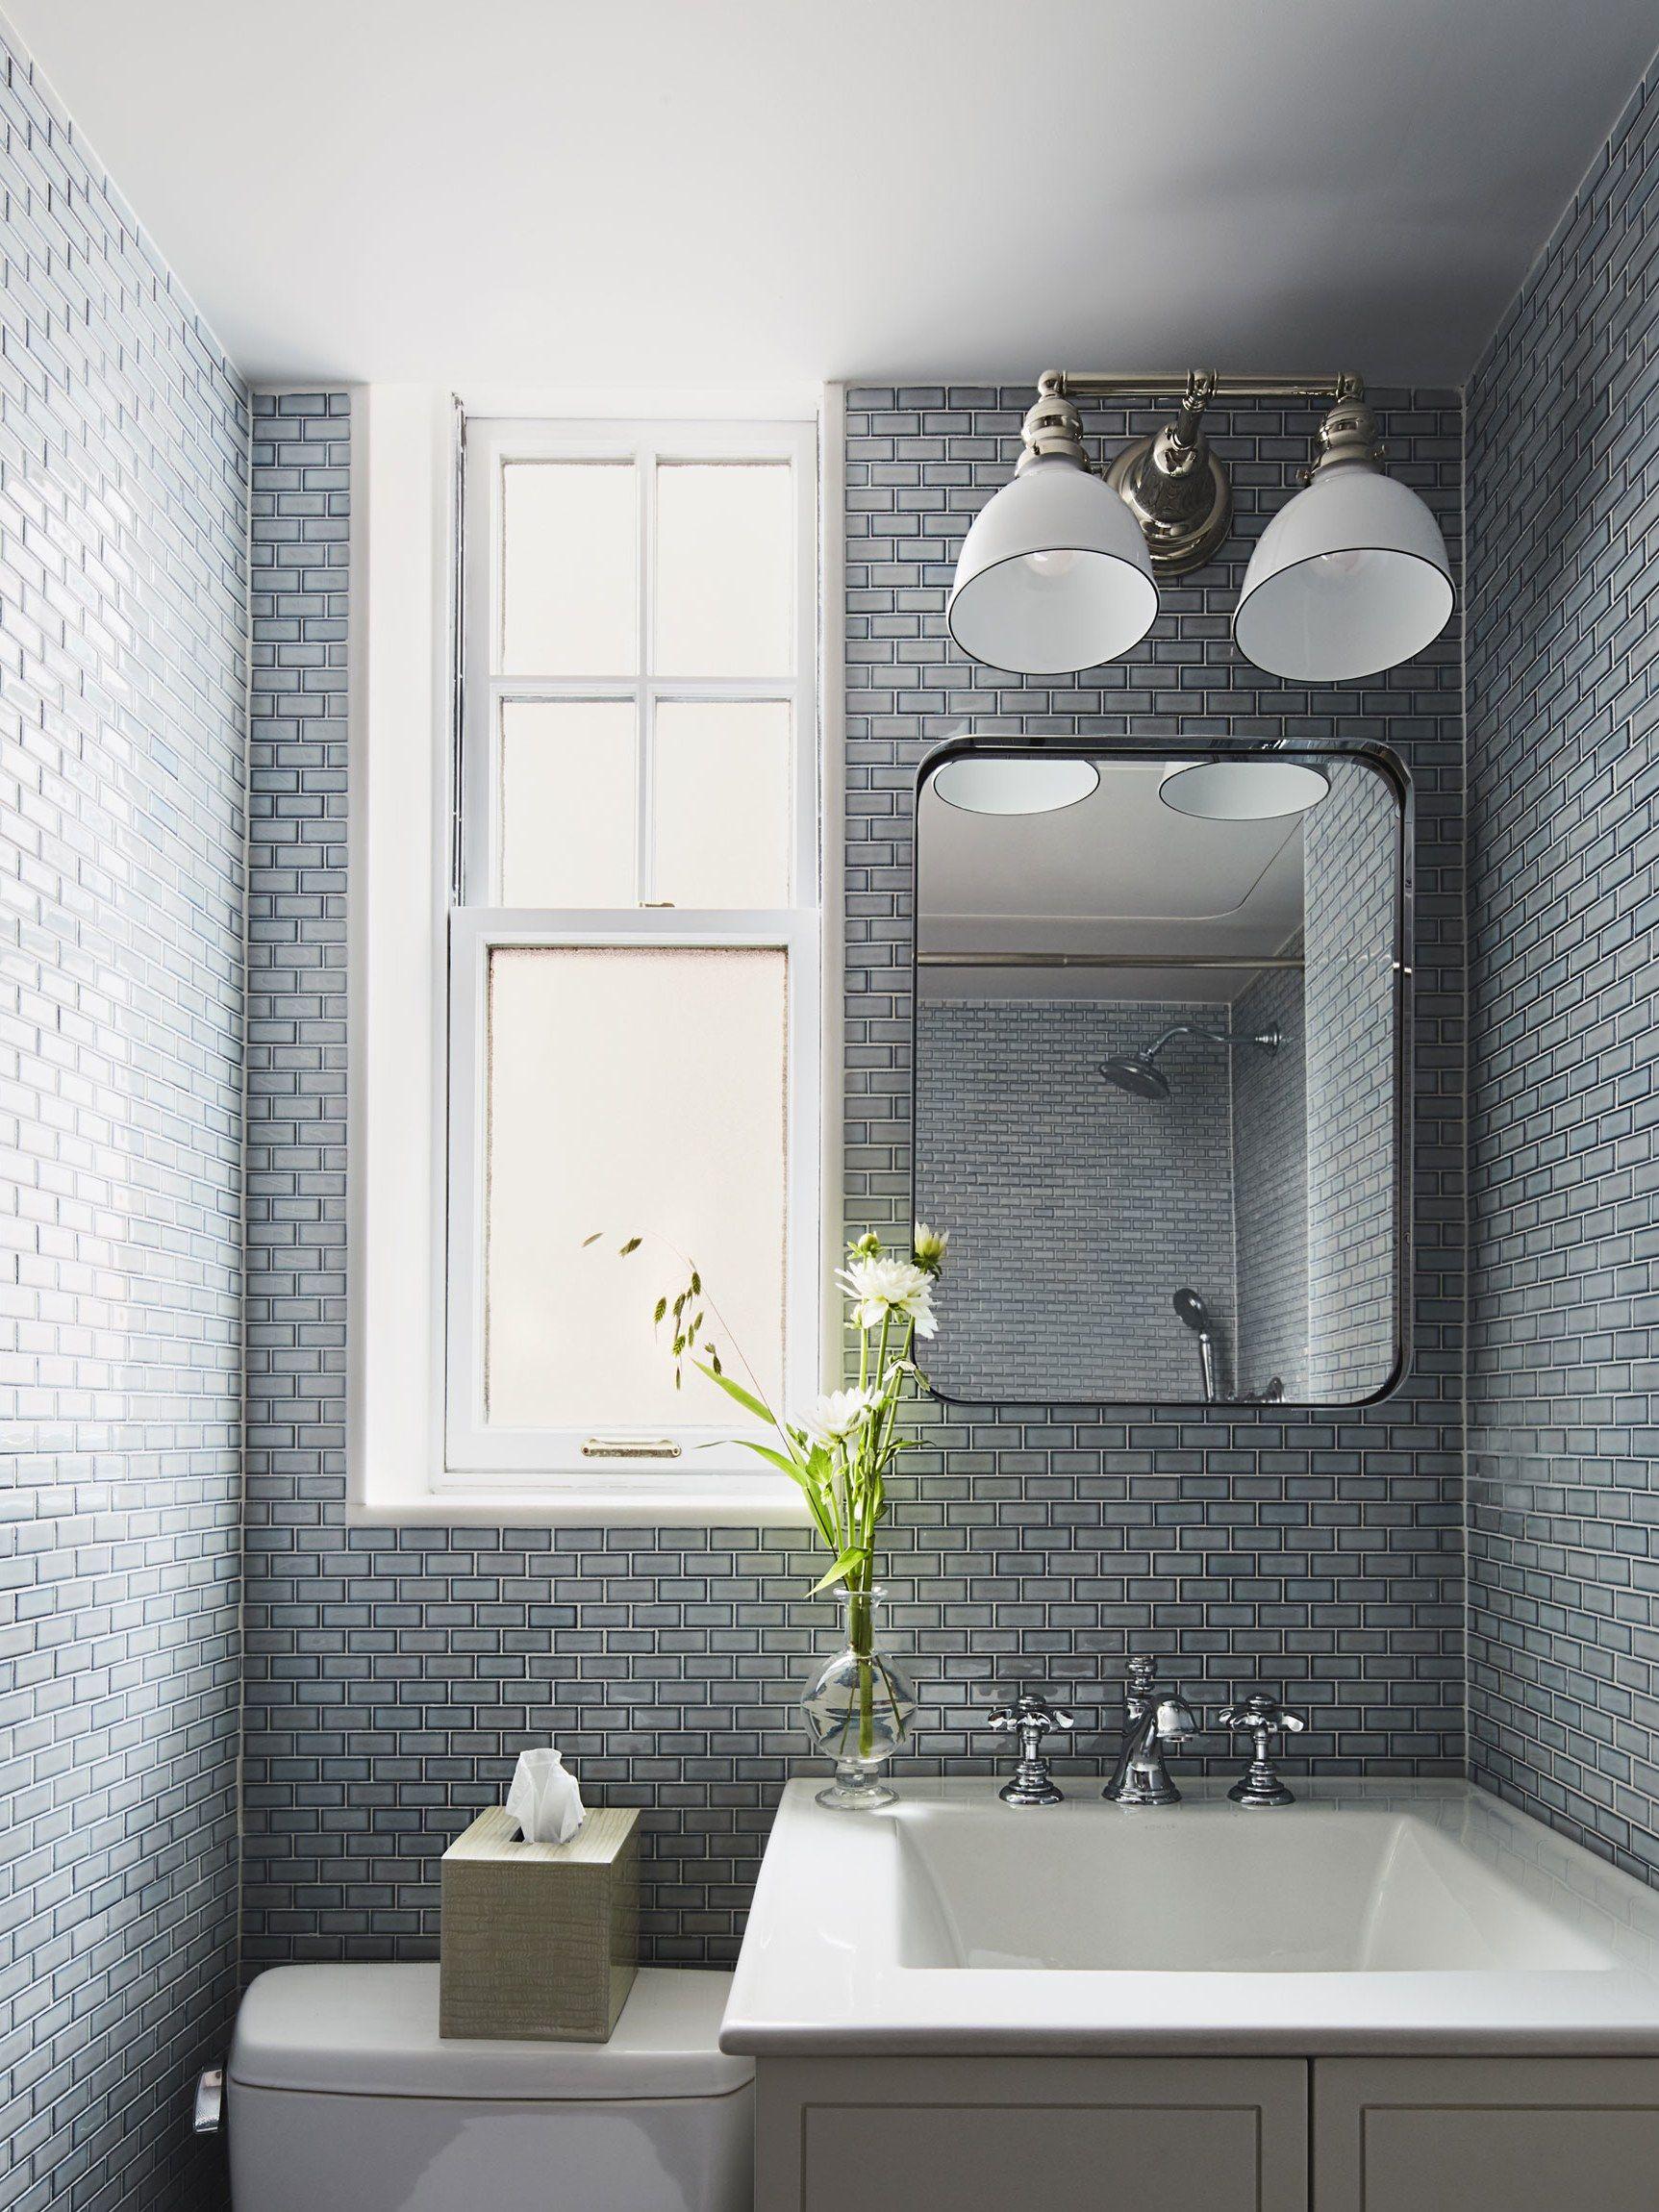 Image Result For Same Tile Everywhere Interior Design Bathroom Tile Designs Small Space Bathroom Tile Bathroom